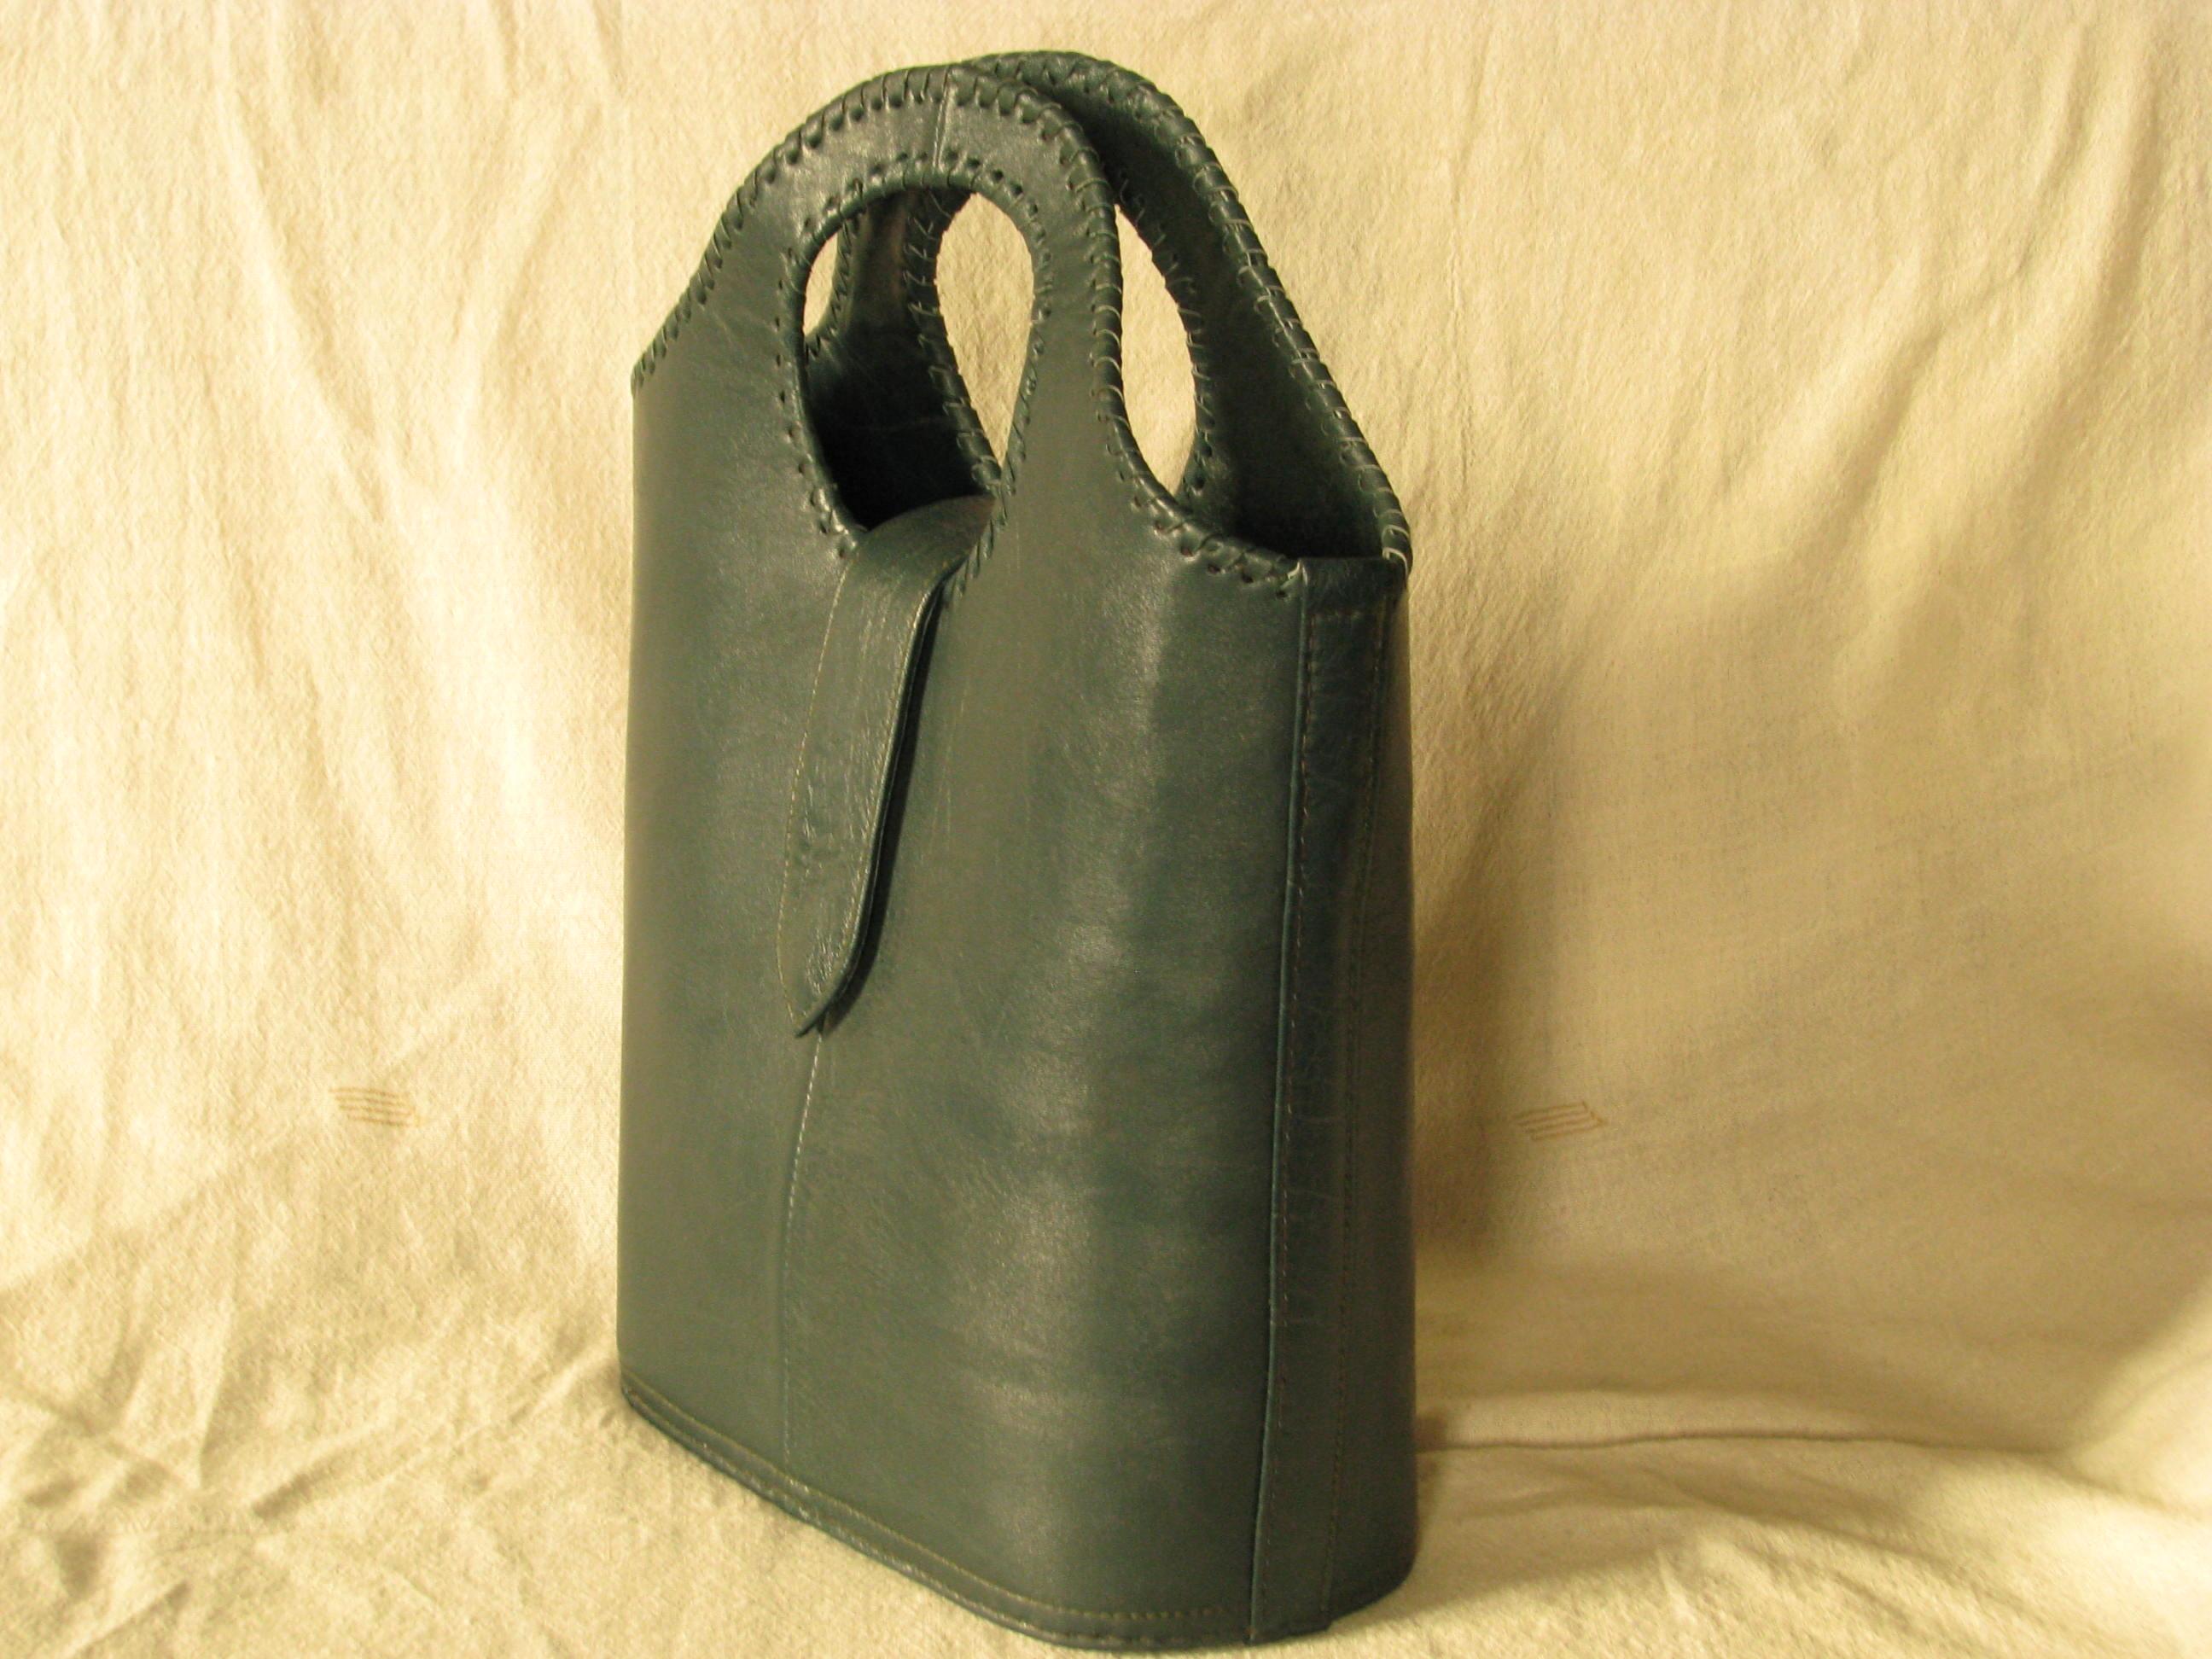 Gundara - dark-green shopper - from Afghanistan - side view - fair trade - genuine leather